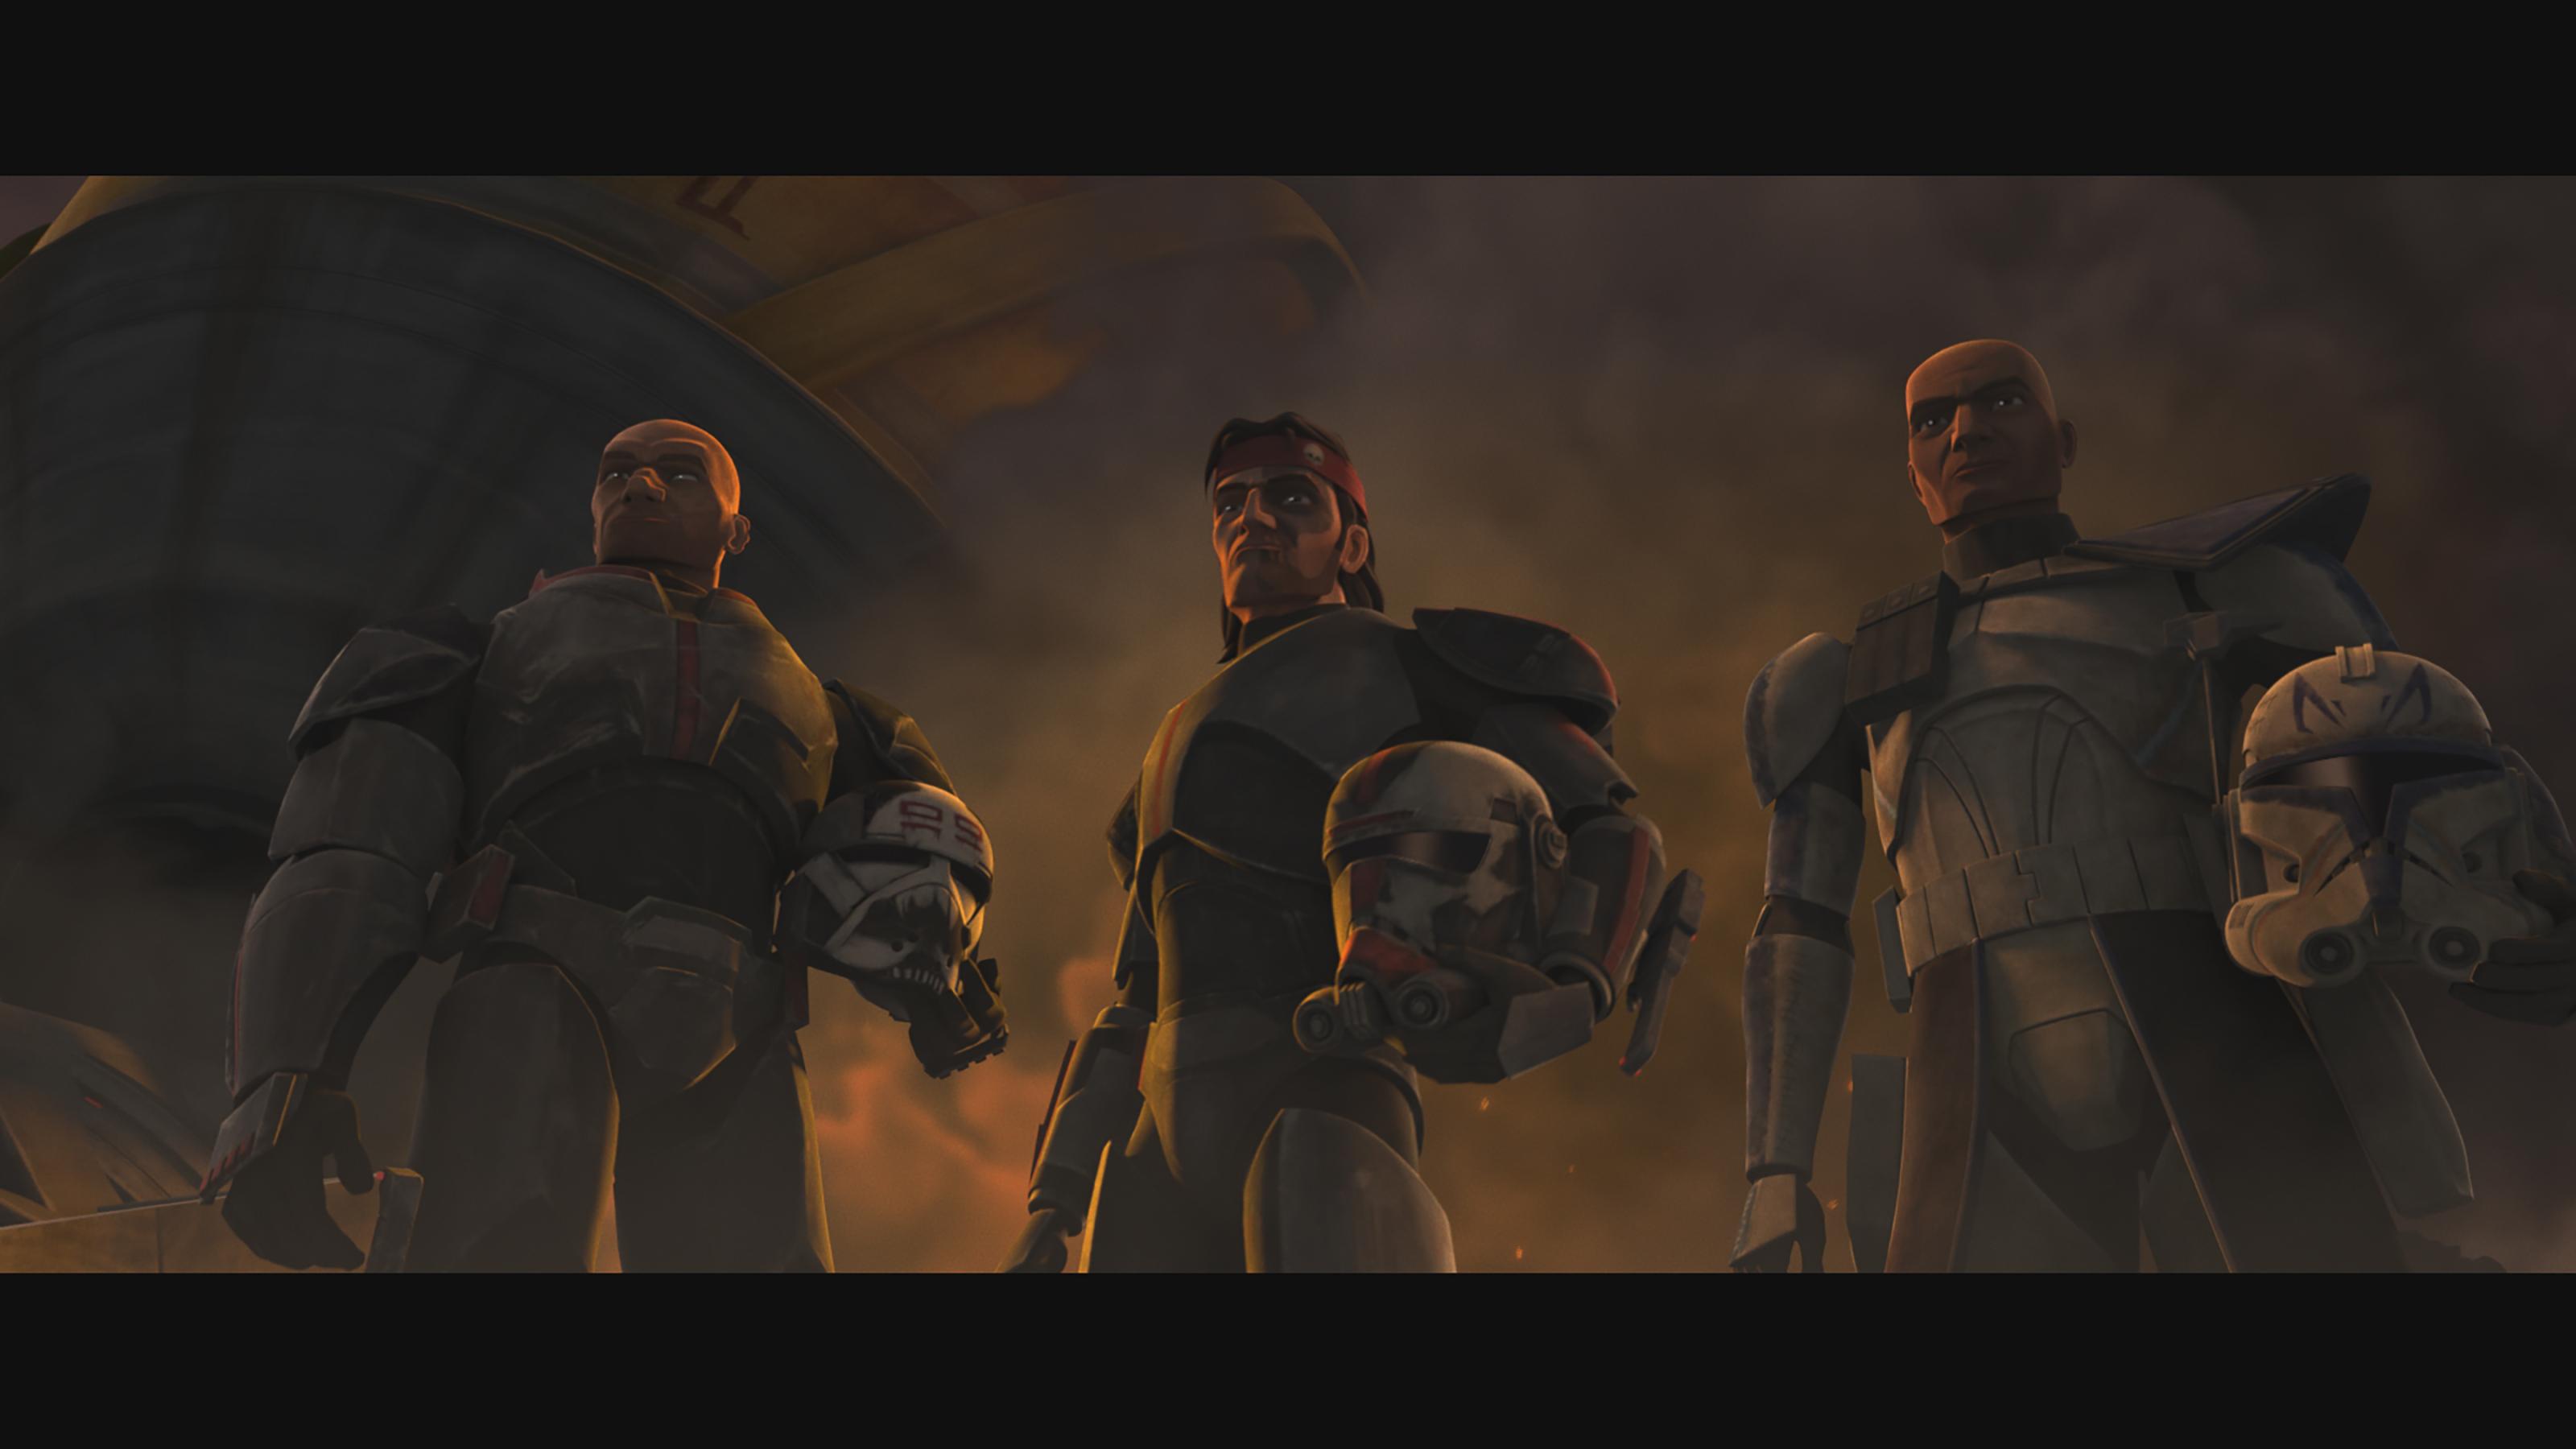 Wic Watches Season 7 Of Star Wars The Clone Wars